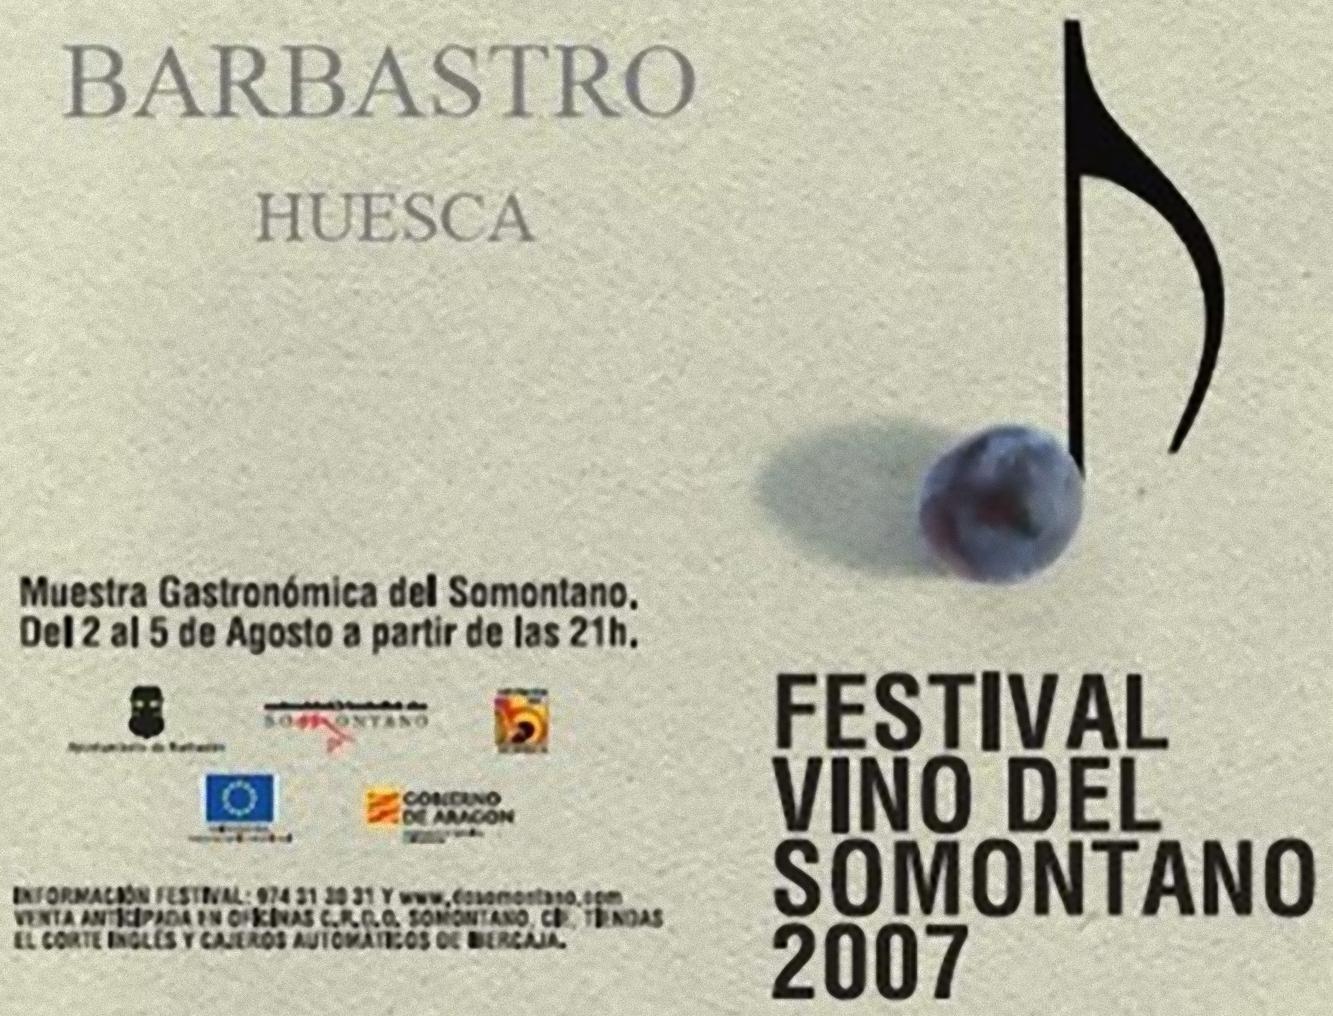 Festival Vino del Somontano 2007